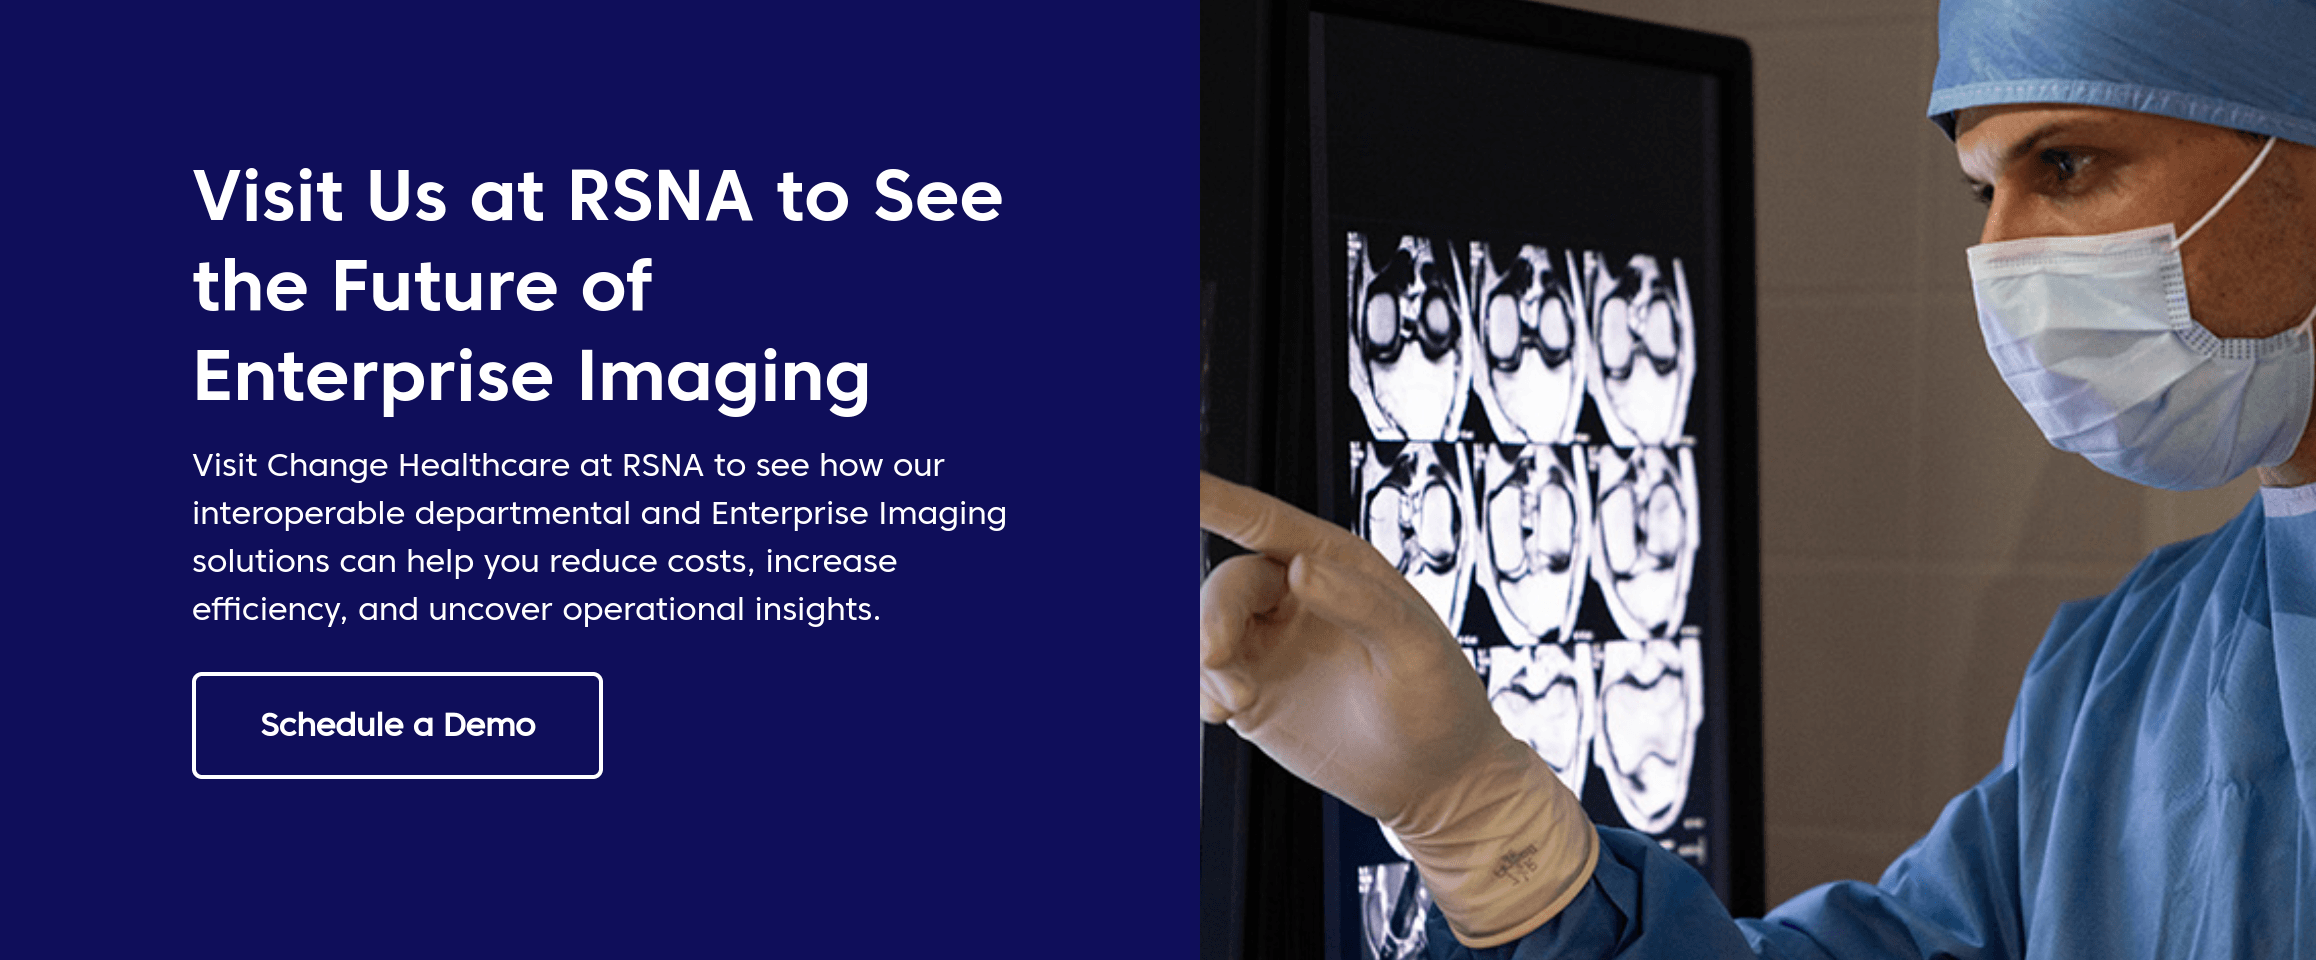 Change Healthcare, Google Expand Enterprise Imaging Platform With 4 Providers